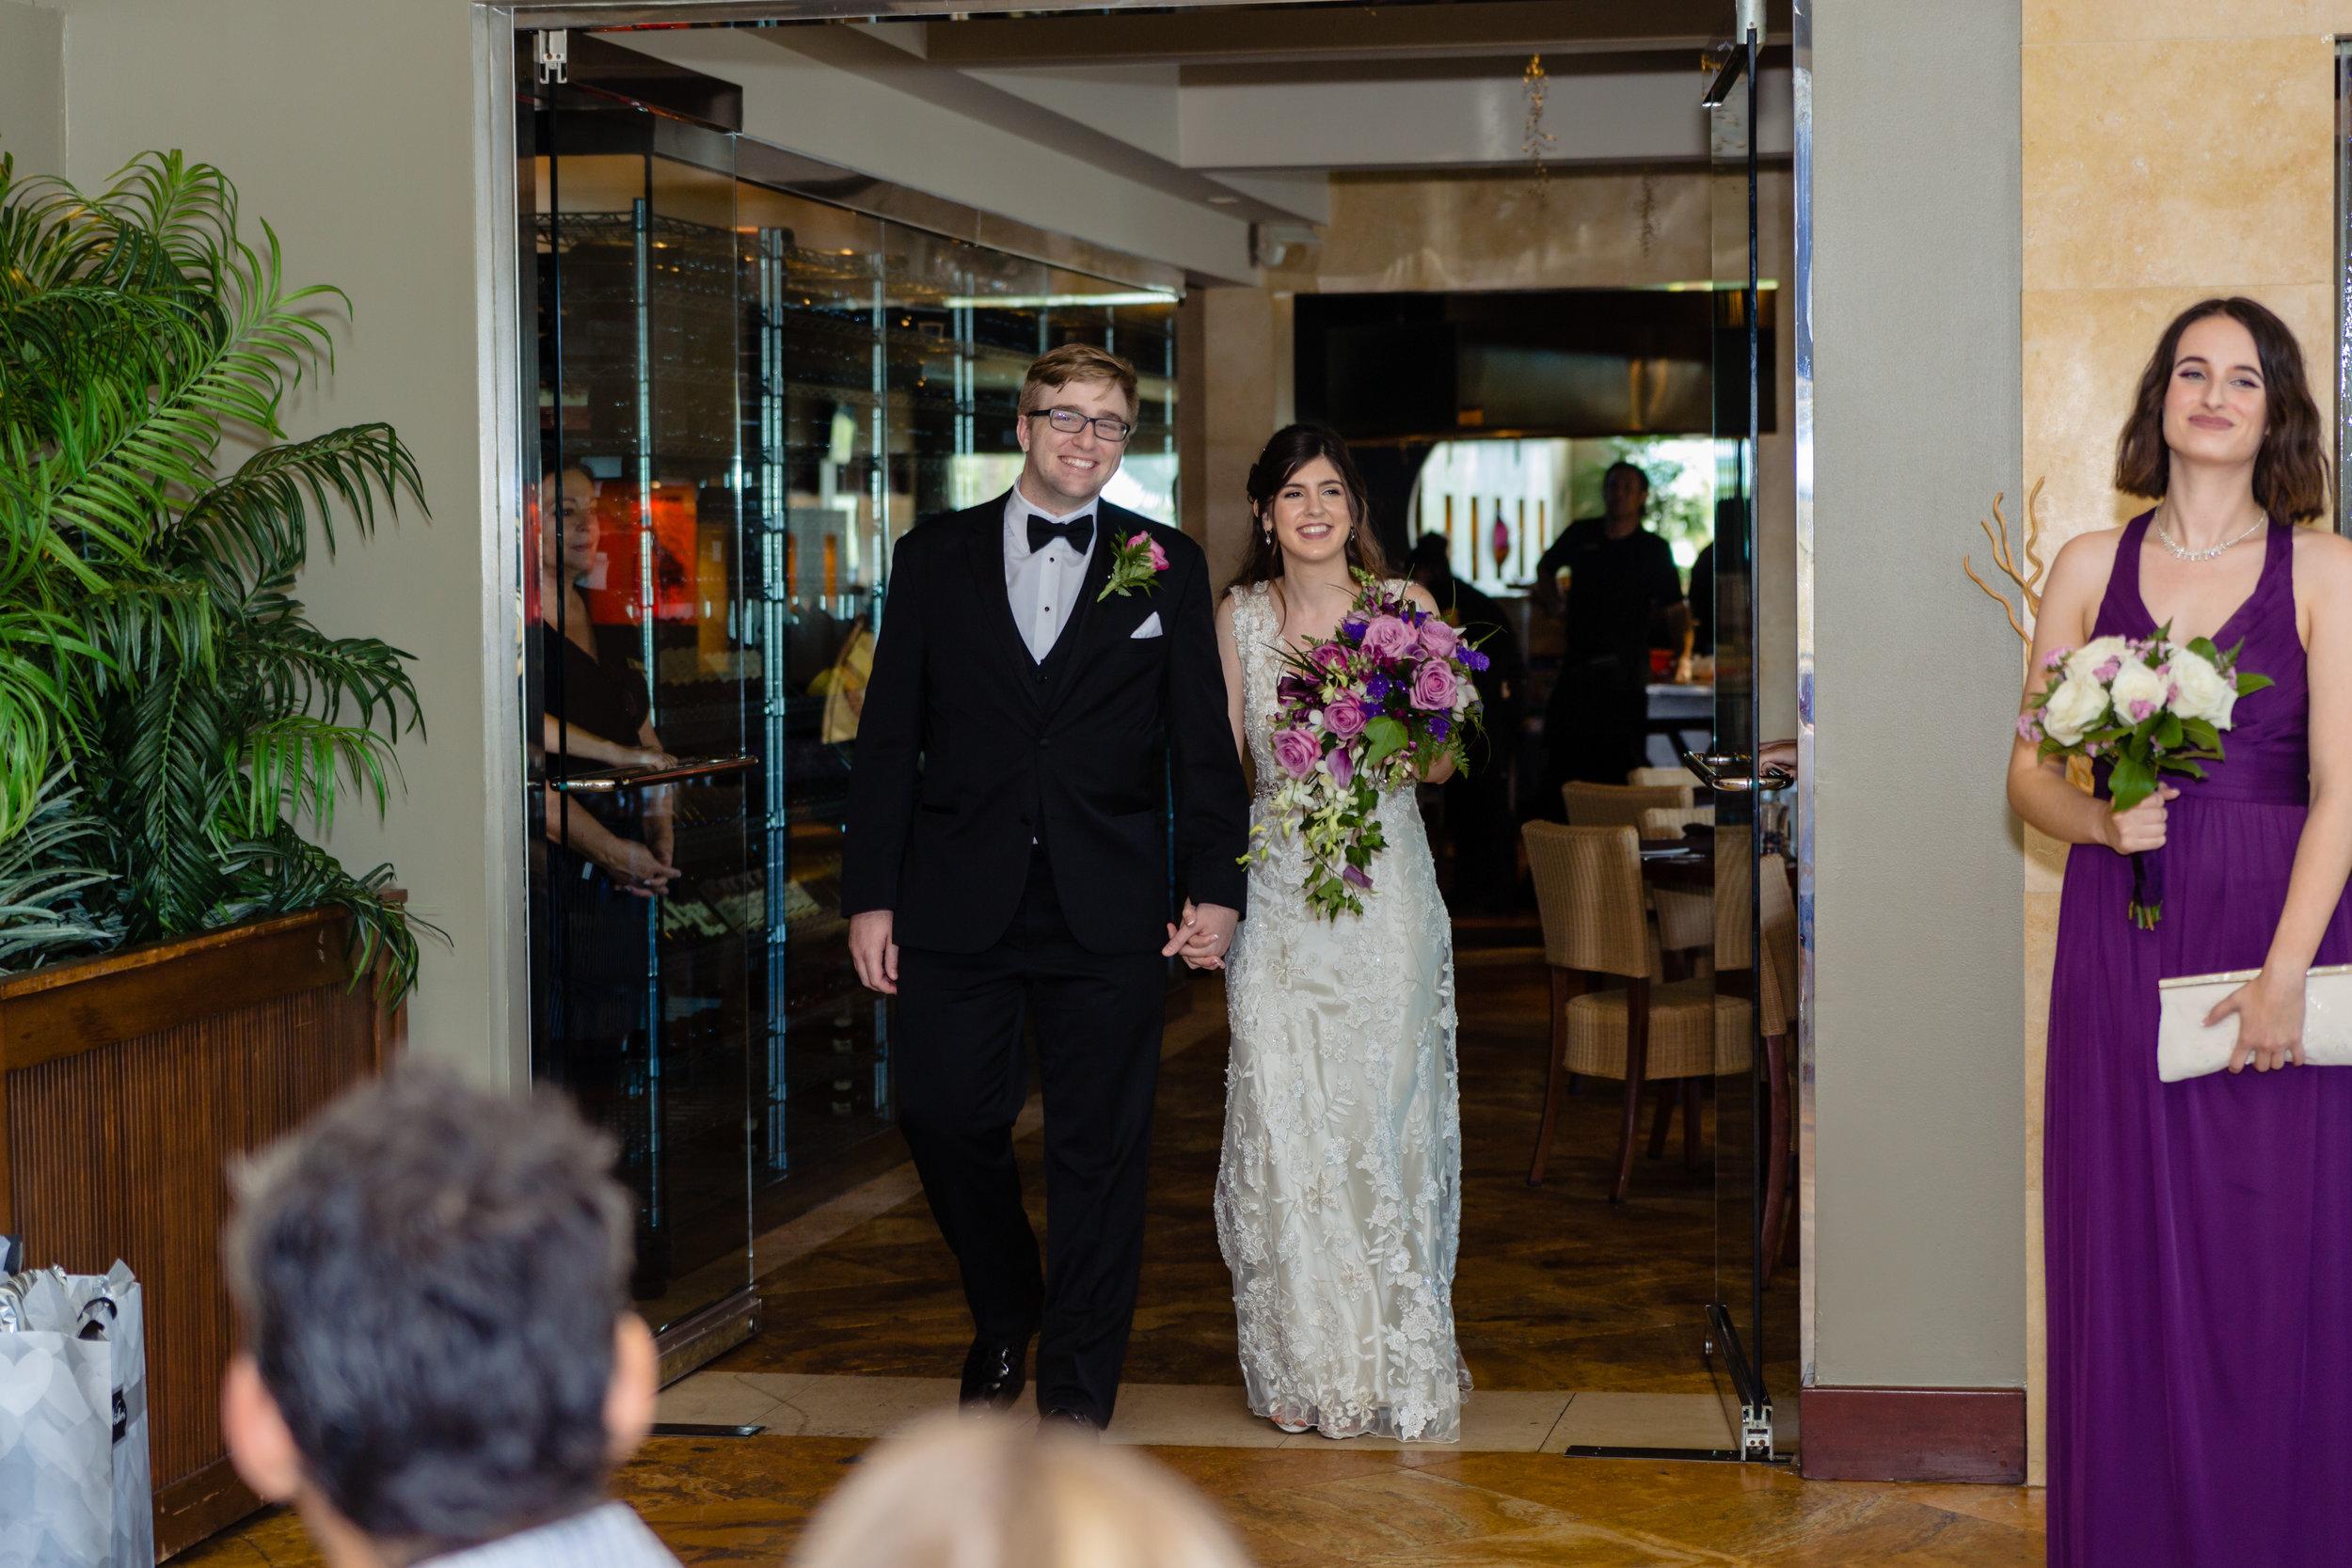 HAH_Zoe and Daniel_Clearwater Wedding_380_2018.jpg